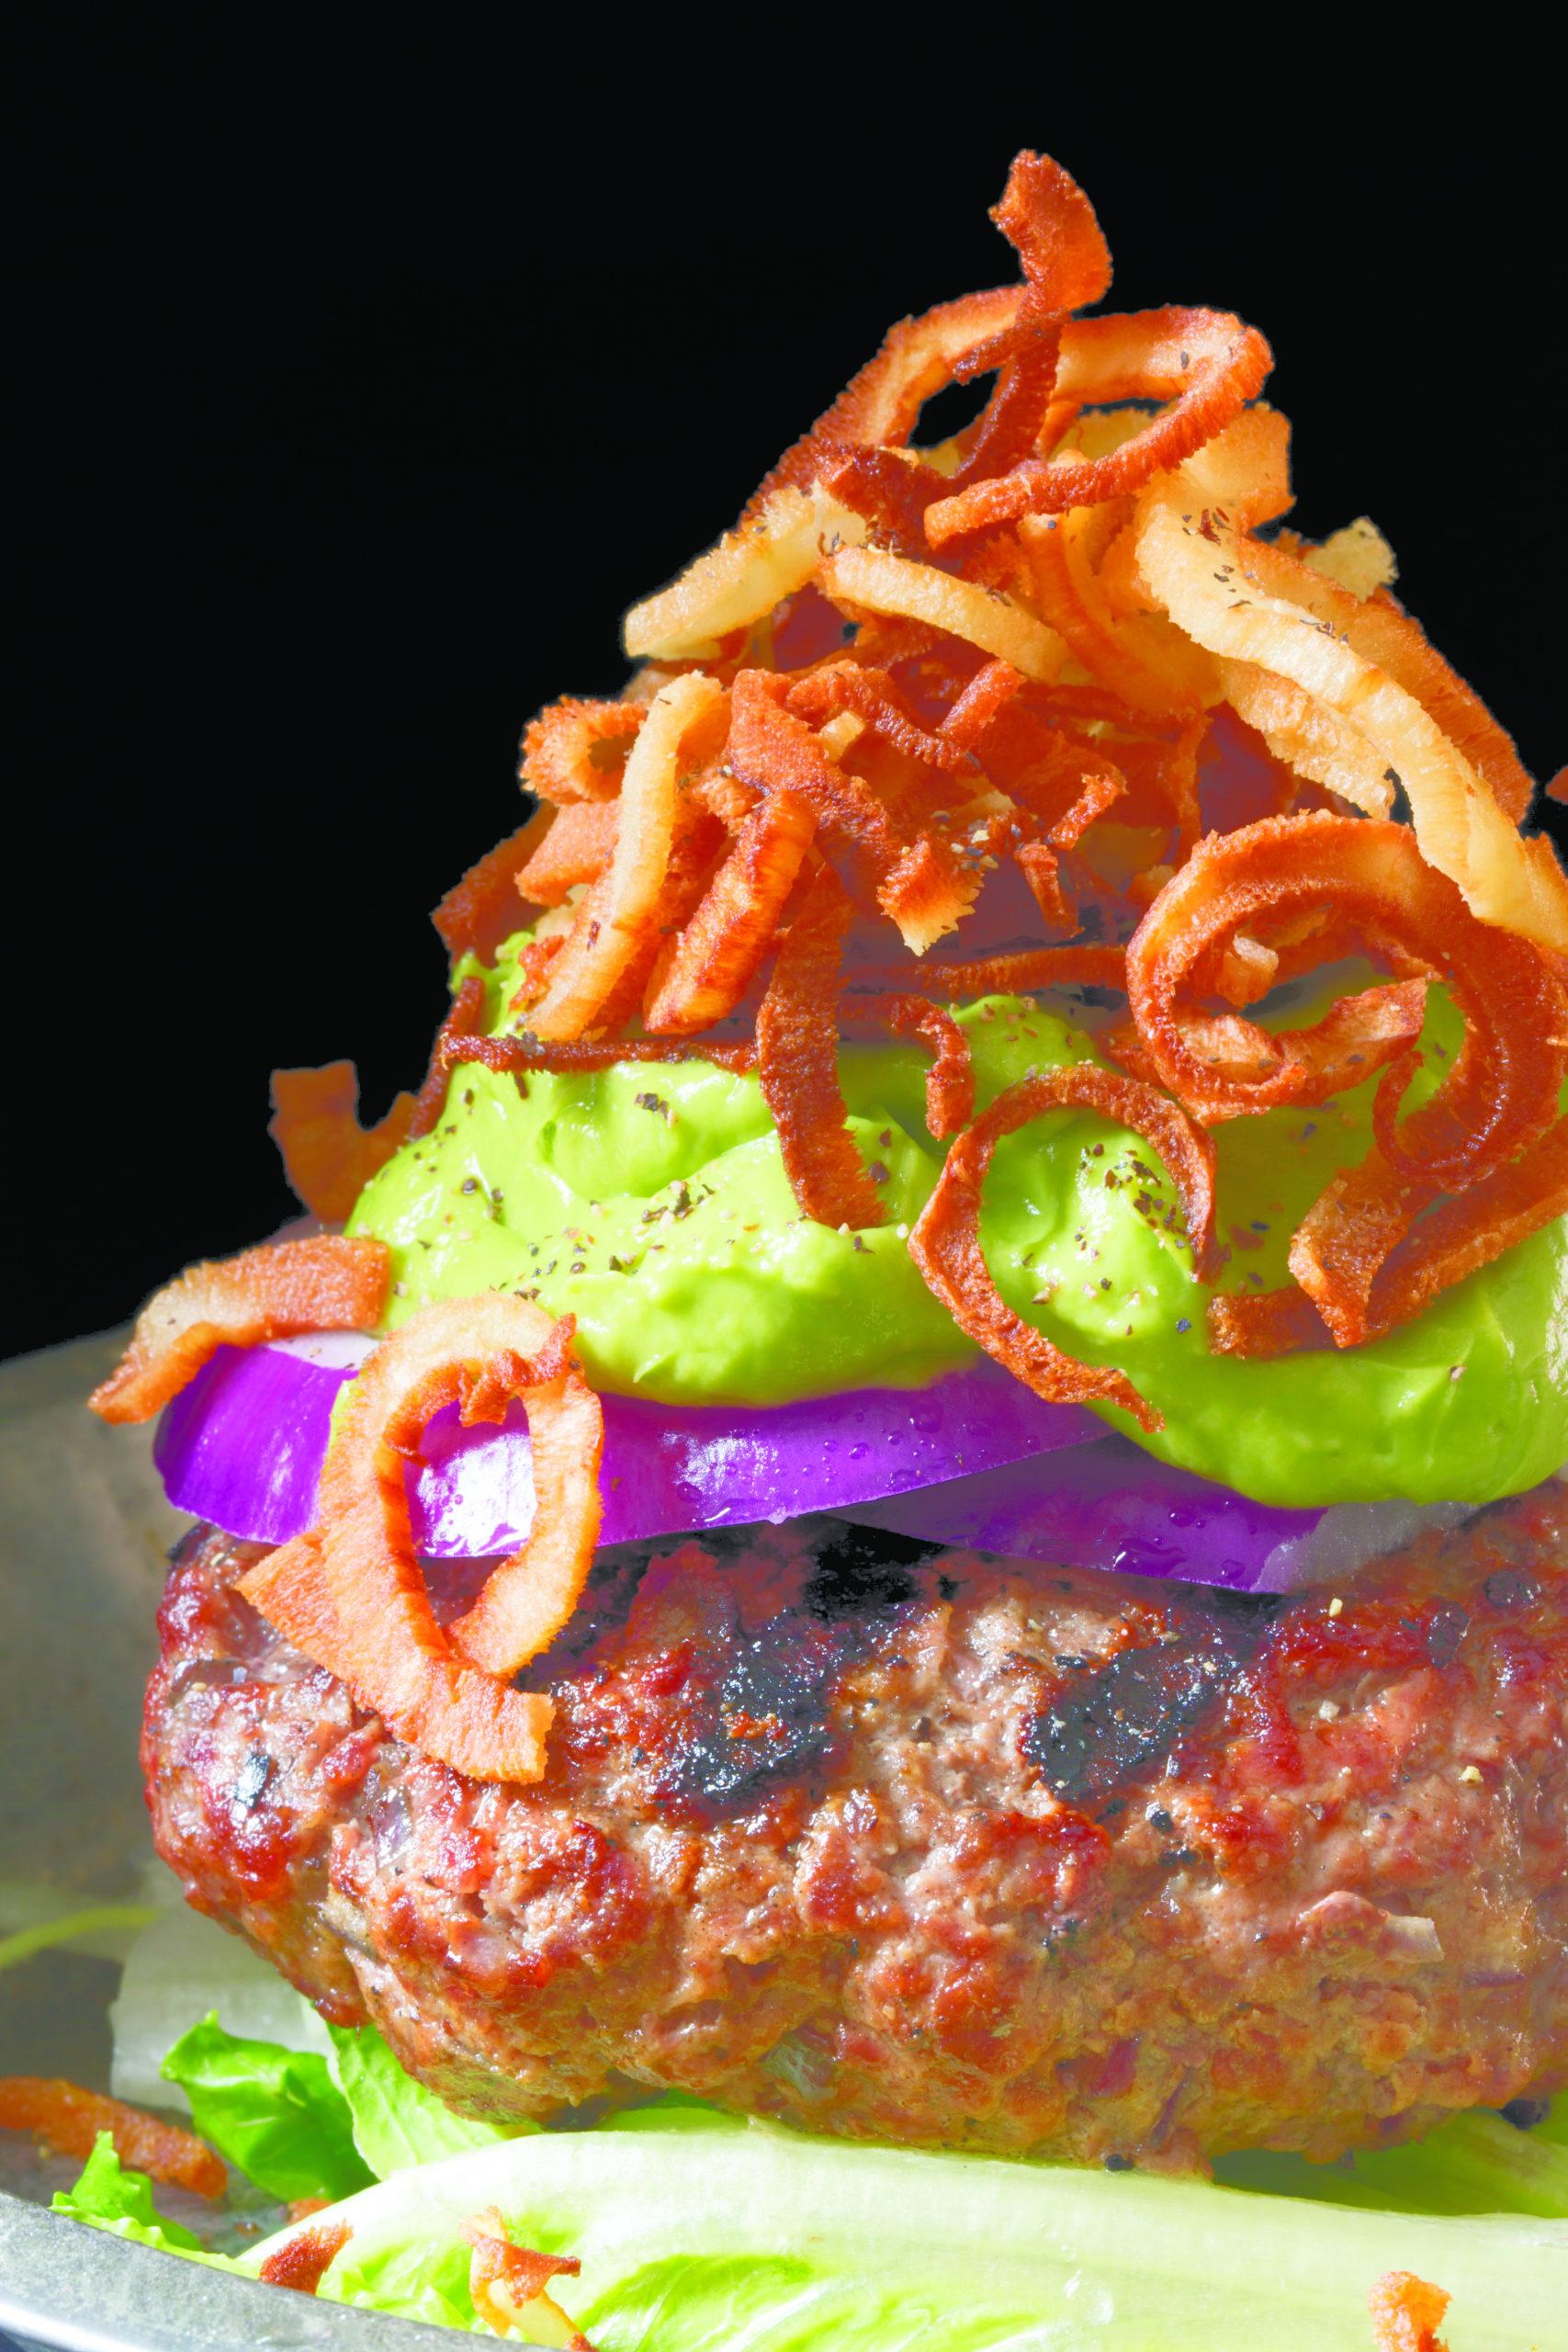 PaleOMG The Paleo Kitchen Sneak Peek - The Perfect Burger